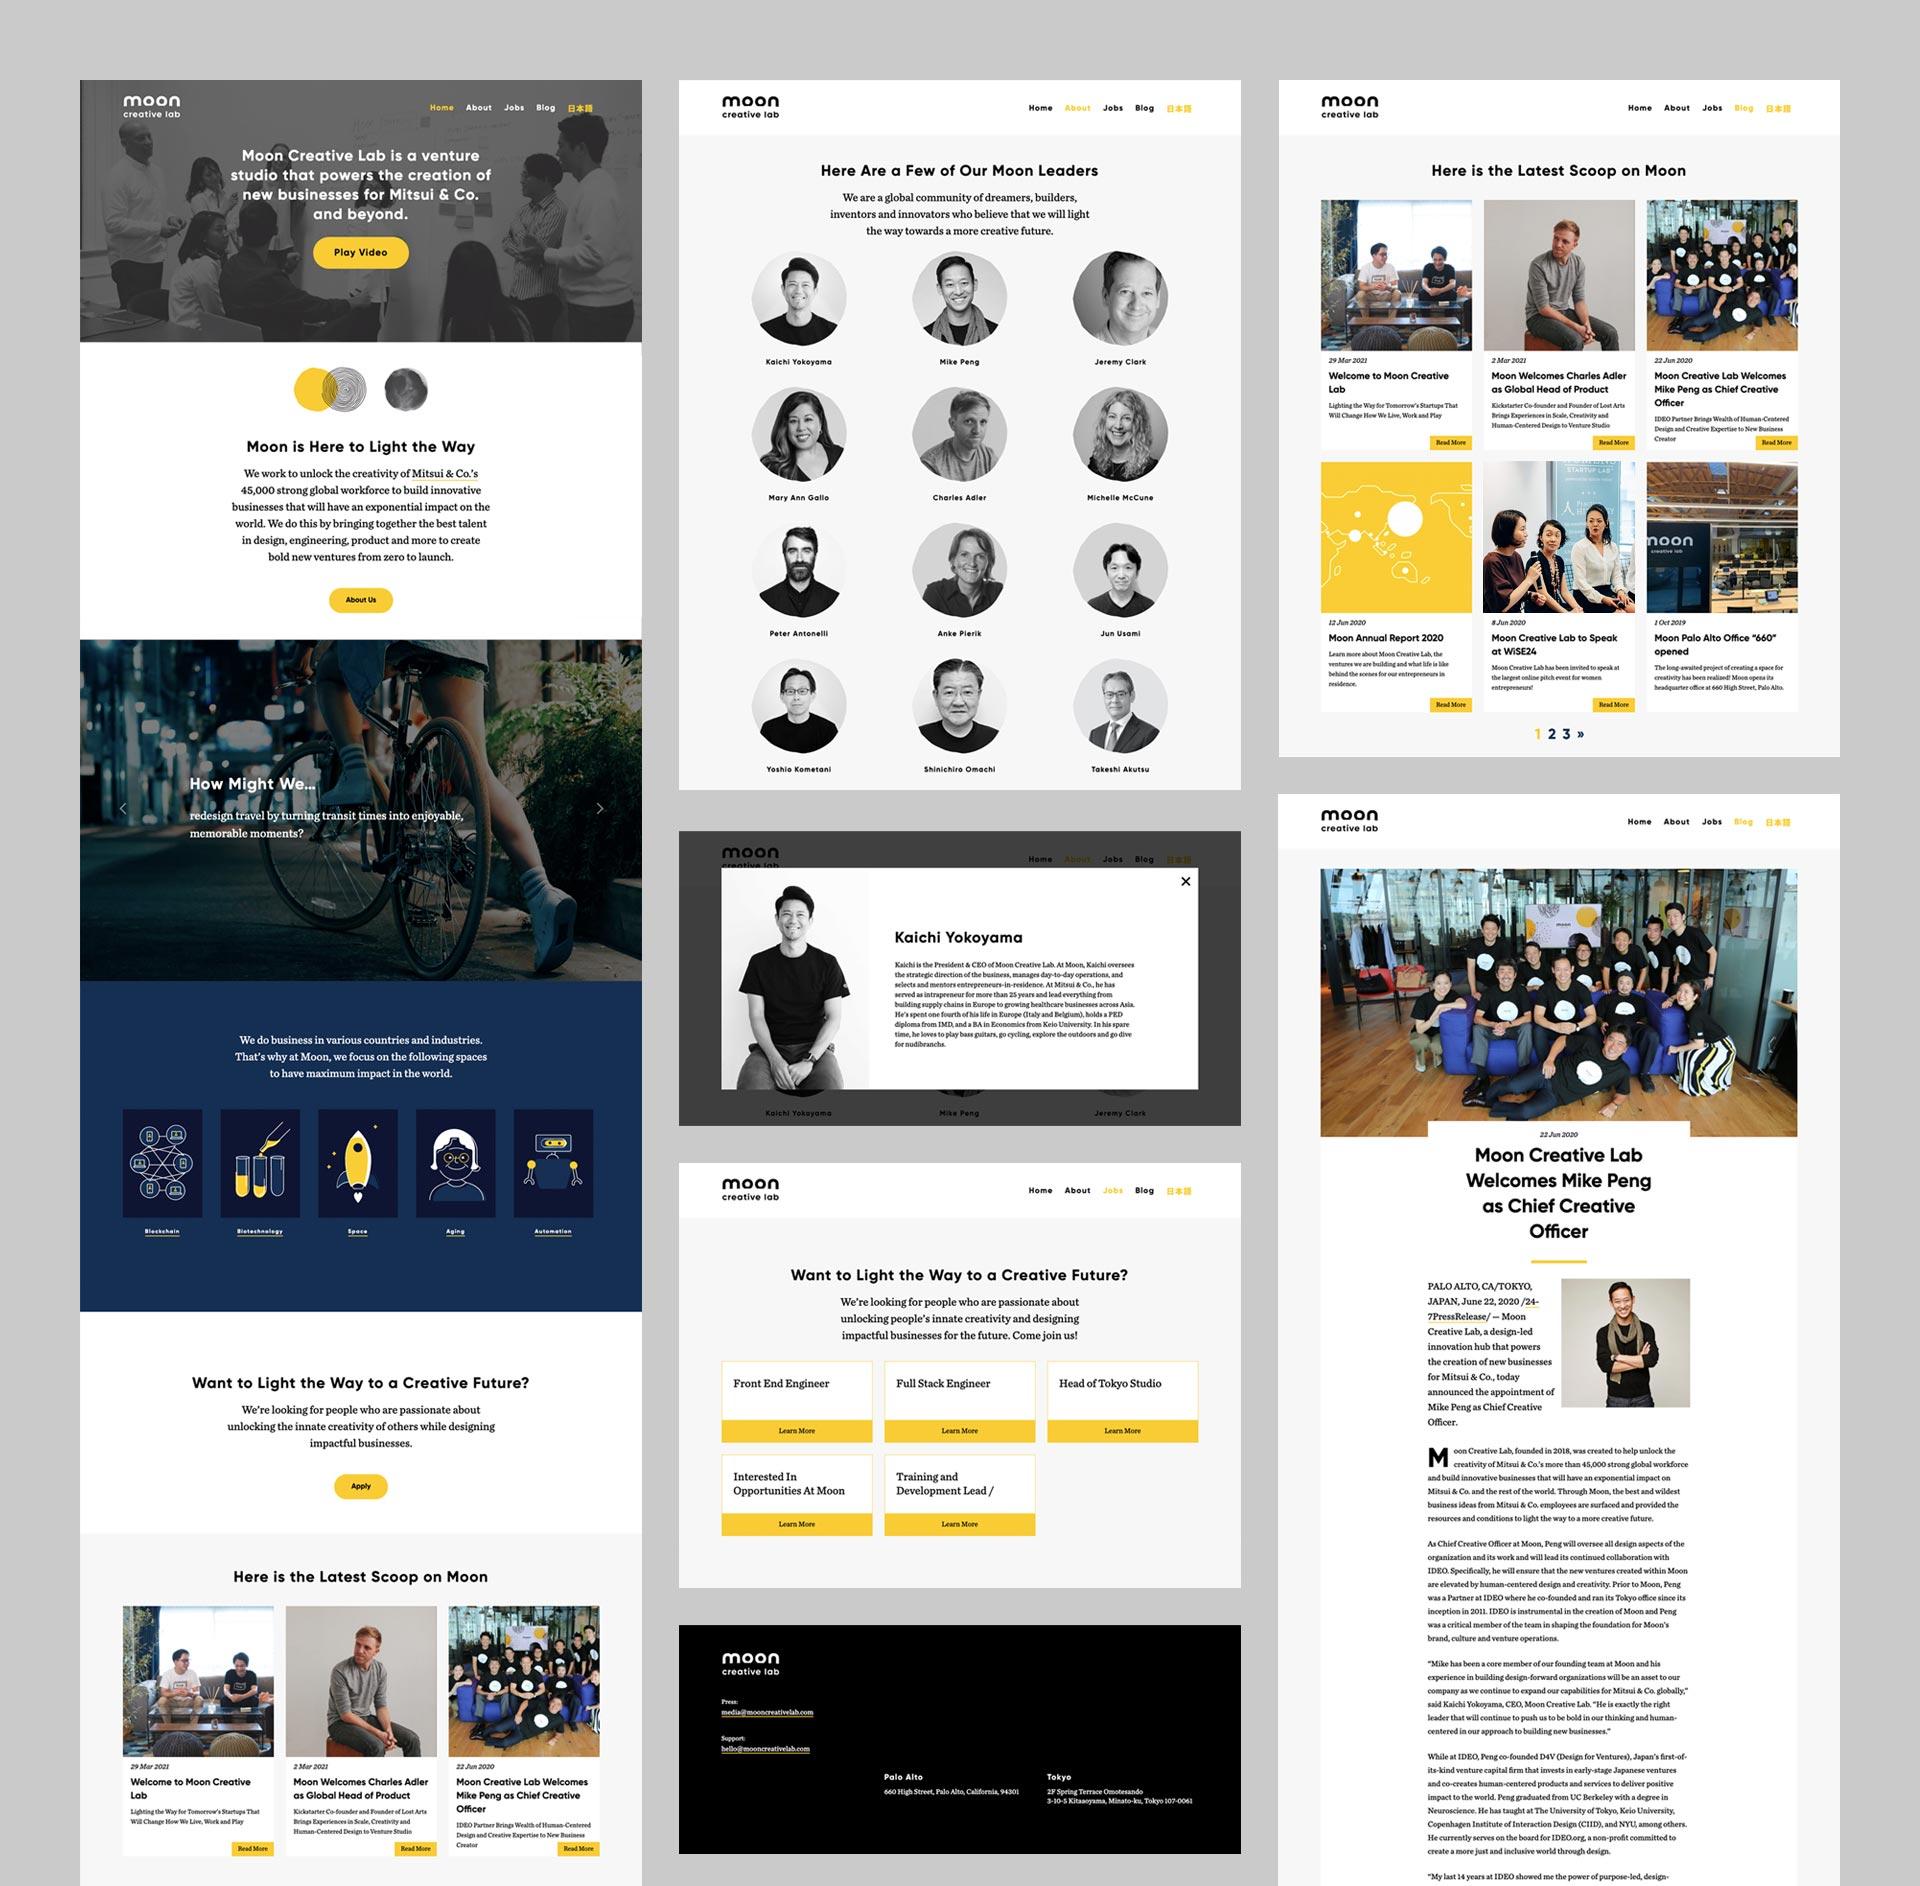 Moon Creative Lab Tokyo - Web Development - UI/UX Design